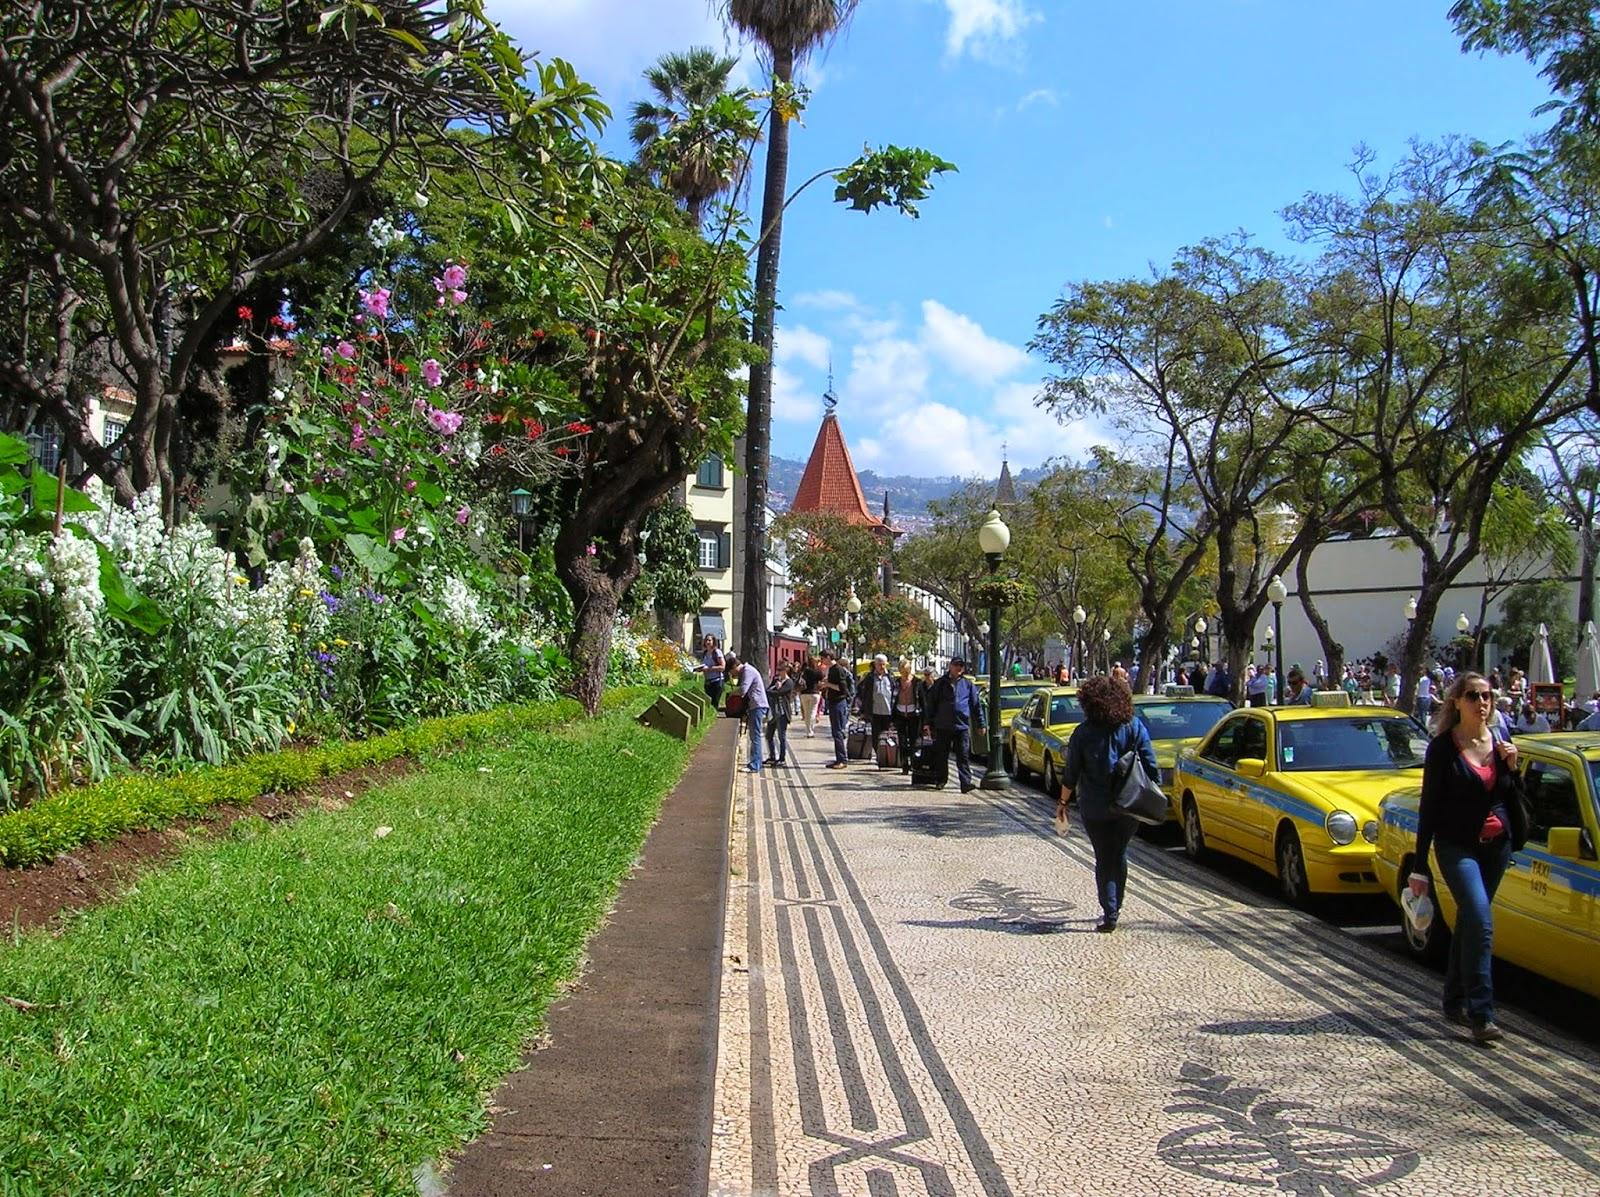 Avenida de Arriaga, Funchal, Madeira, Portugal, La vuelta al mundo de Asun y Ricardo, round the world, mundoporlibre.com